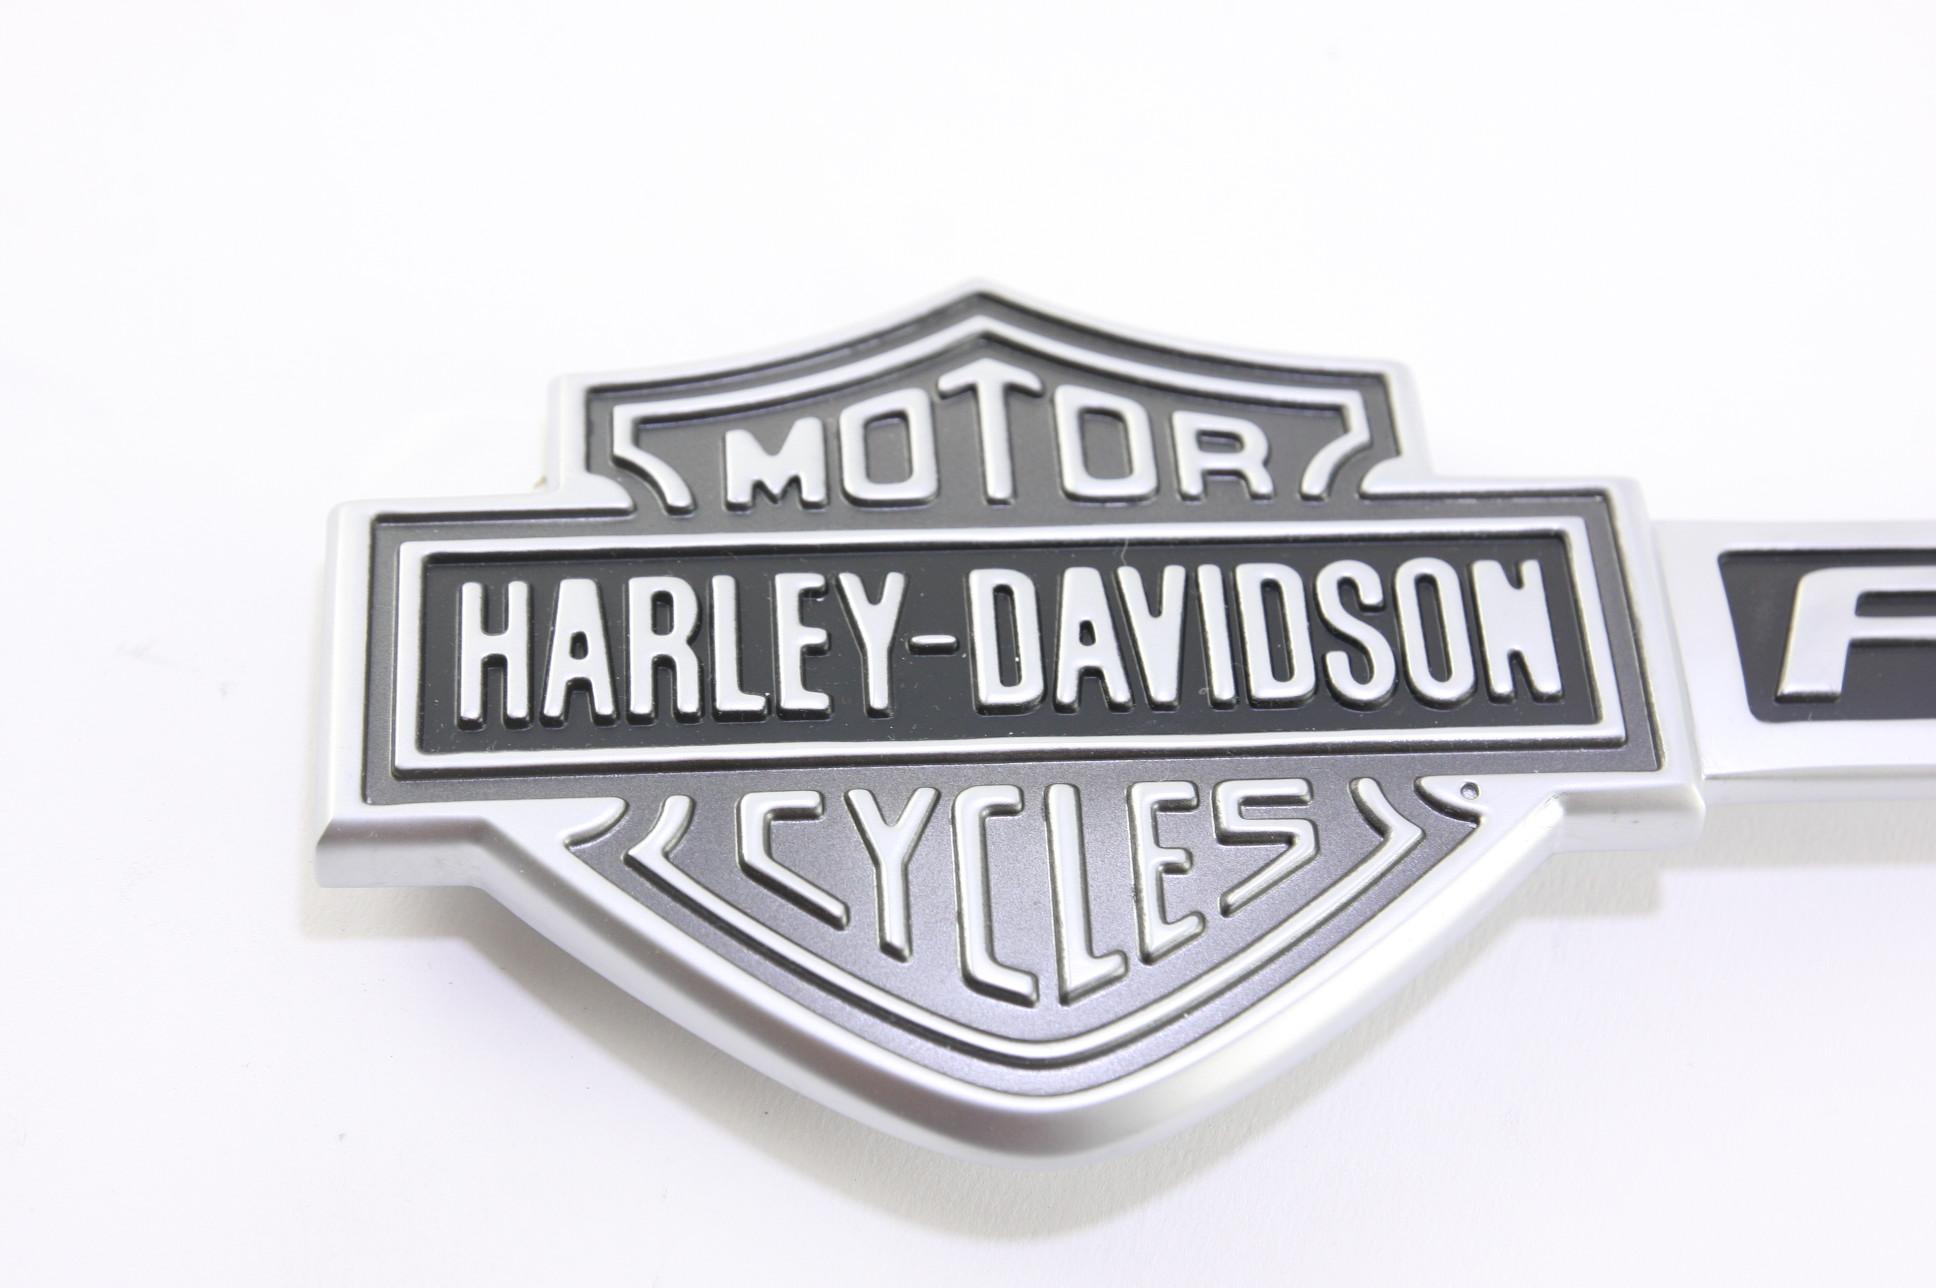 *** New Genuine Ford OEM BL3Z16720B 09-12 F150 Harley Davidson Free Shipping NIP - image 2